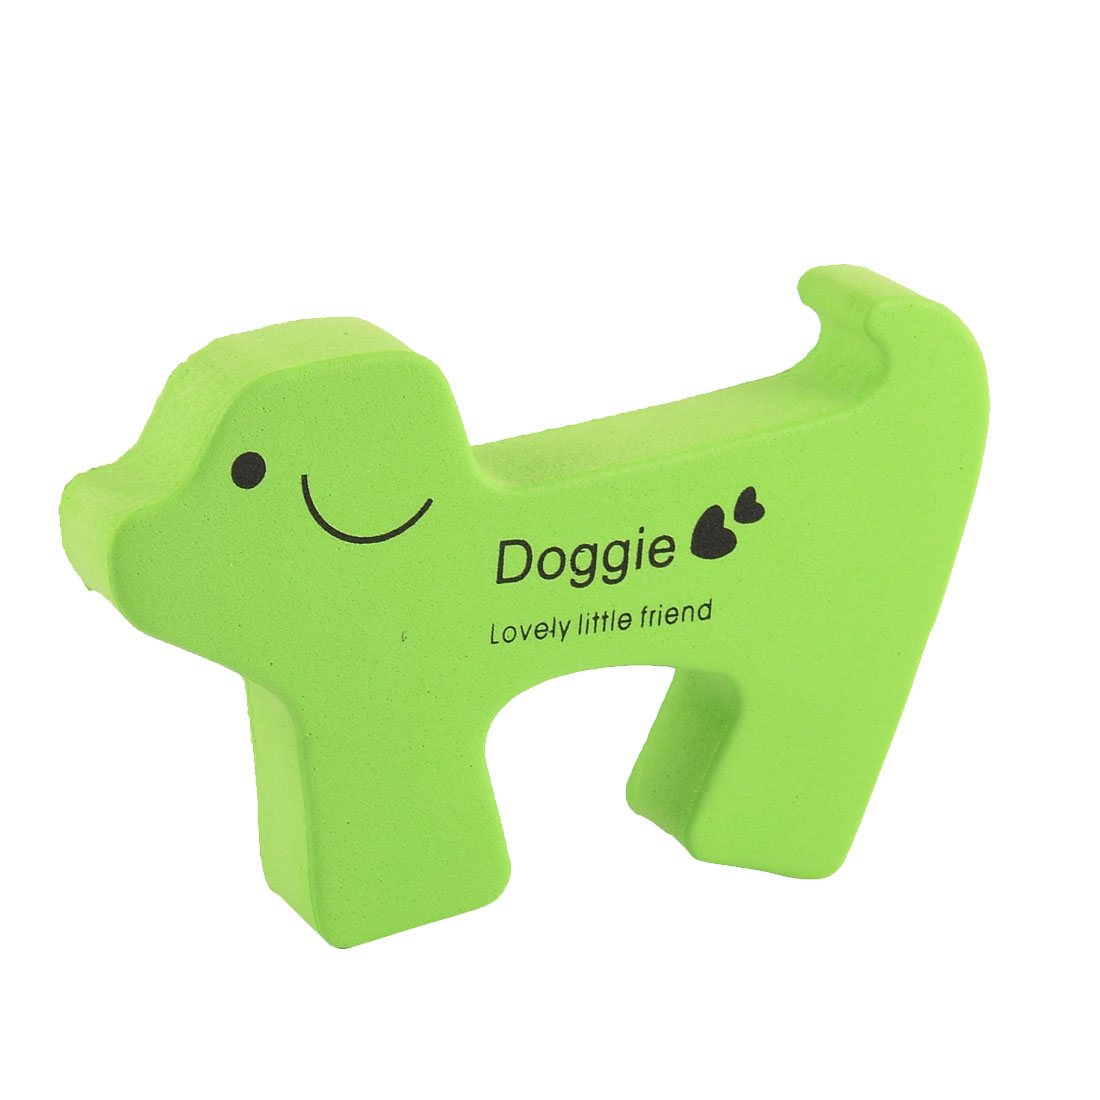 Cartoon Dog Shape Finger Protector Door Stopper Lock Safety Guard Green